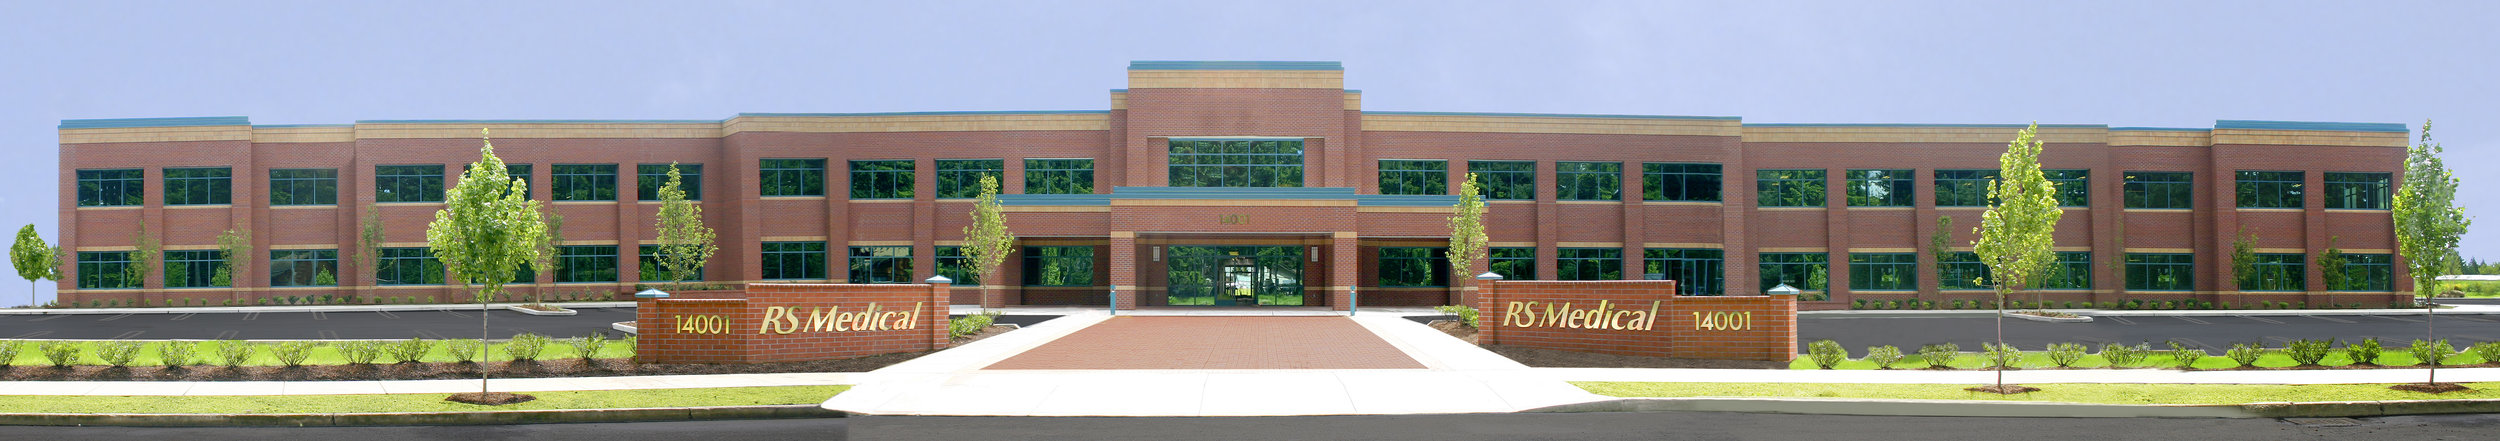 Building 3 composite - FLAT.jpg